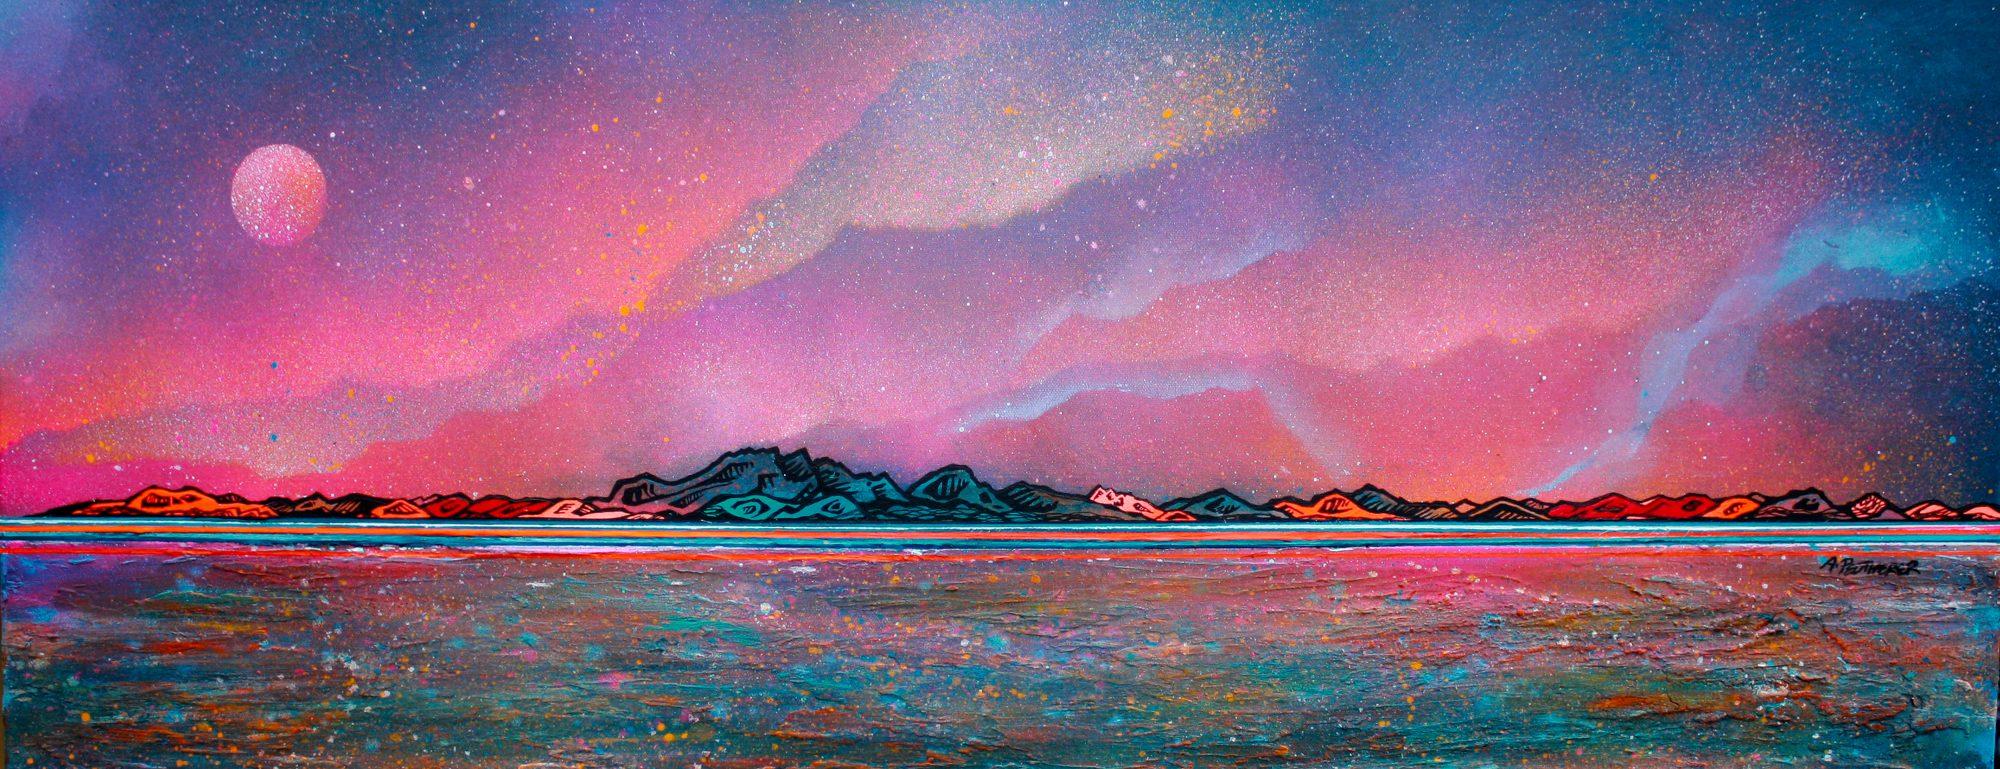 Isle Of Arran - original Painting Canvas & Art Prints - 3D View